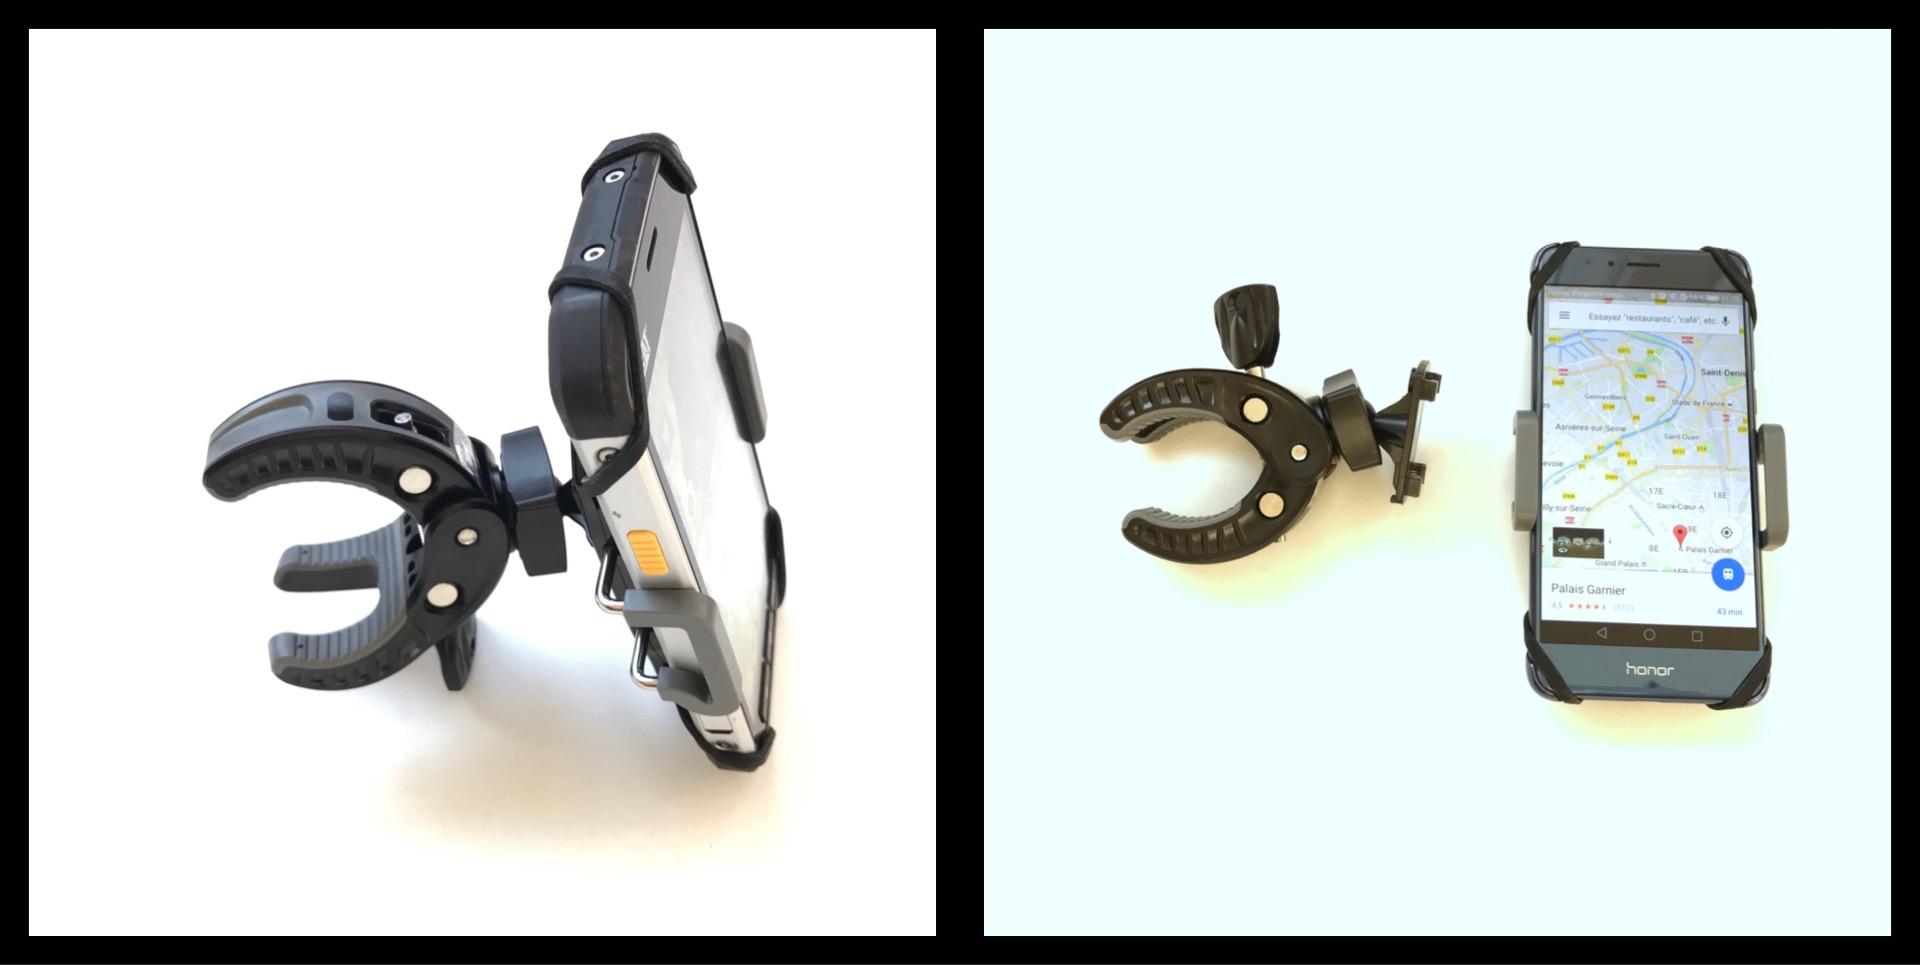 Le support vélo pour smartphone PNY Expand Bike Mount, 03 2017, Ph. Moctar KANE.